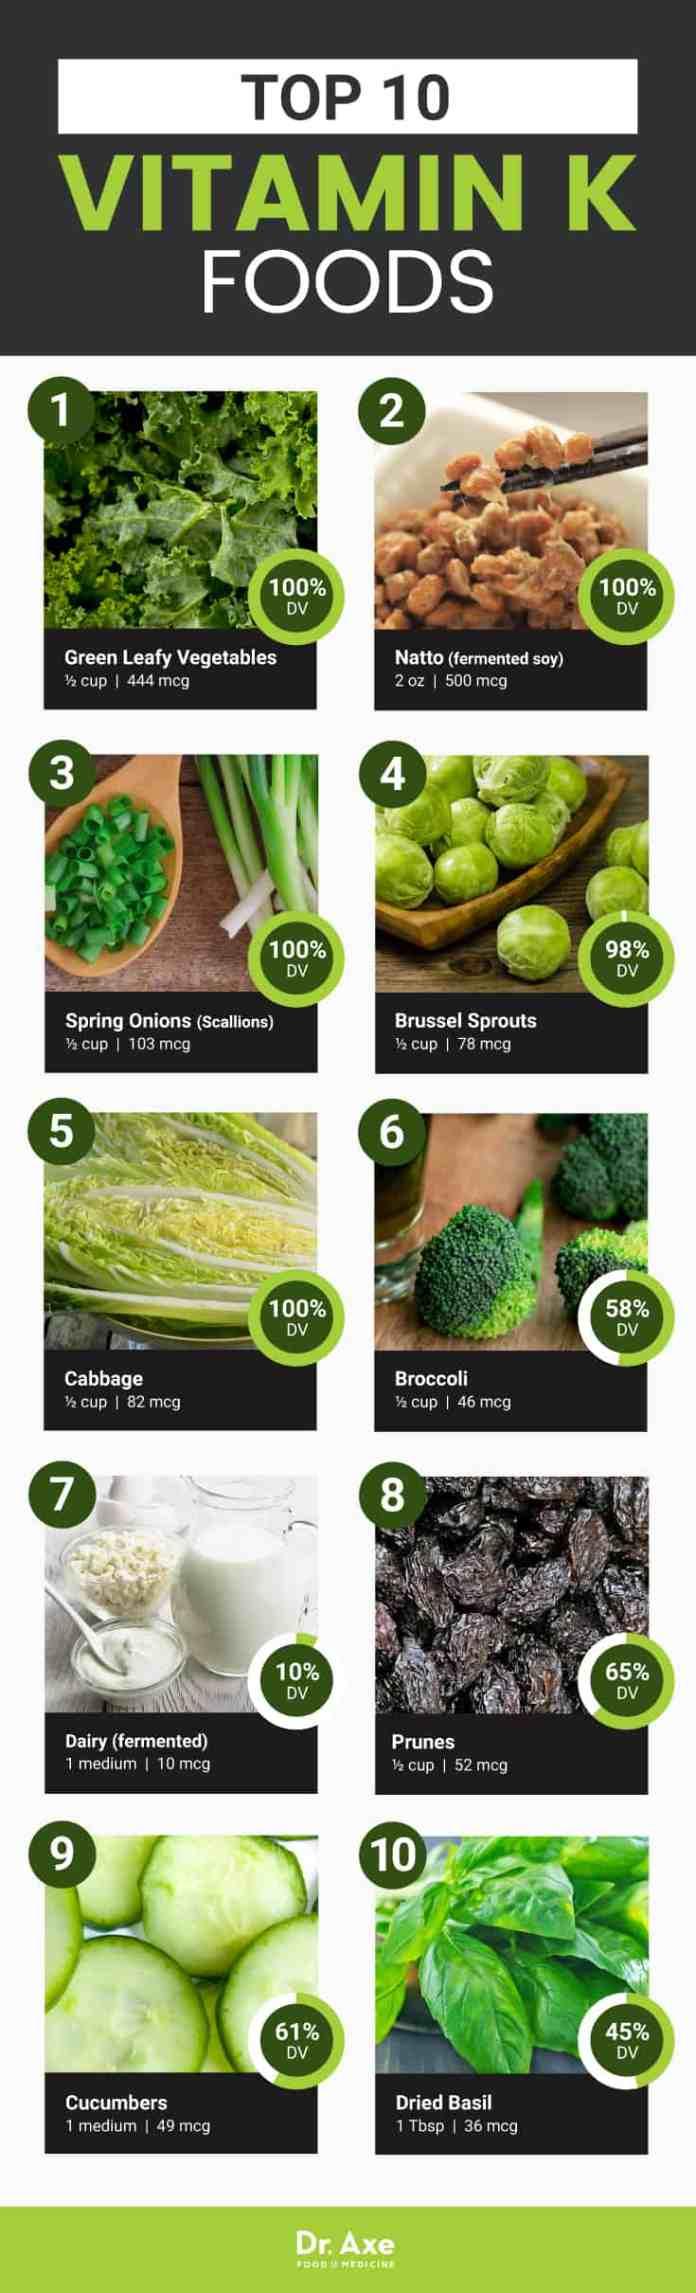 Fermented Foods High In Vitamin K